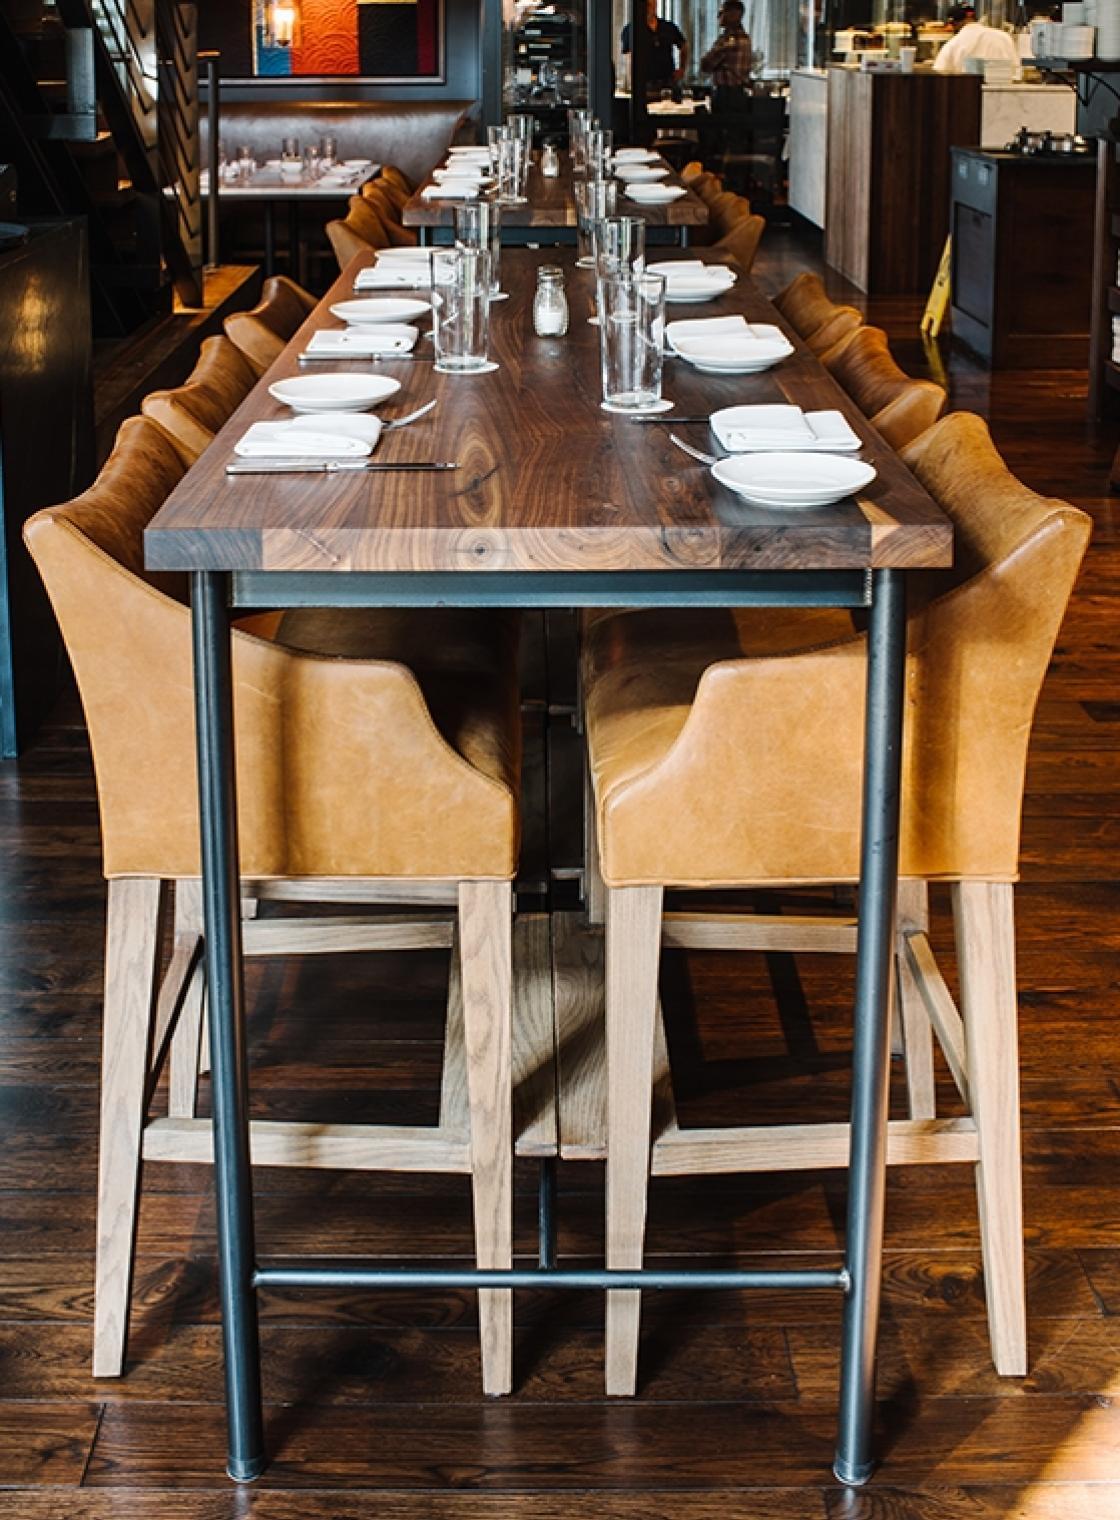 South City Kitchen Buckhead skylar morgan furniture + design